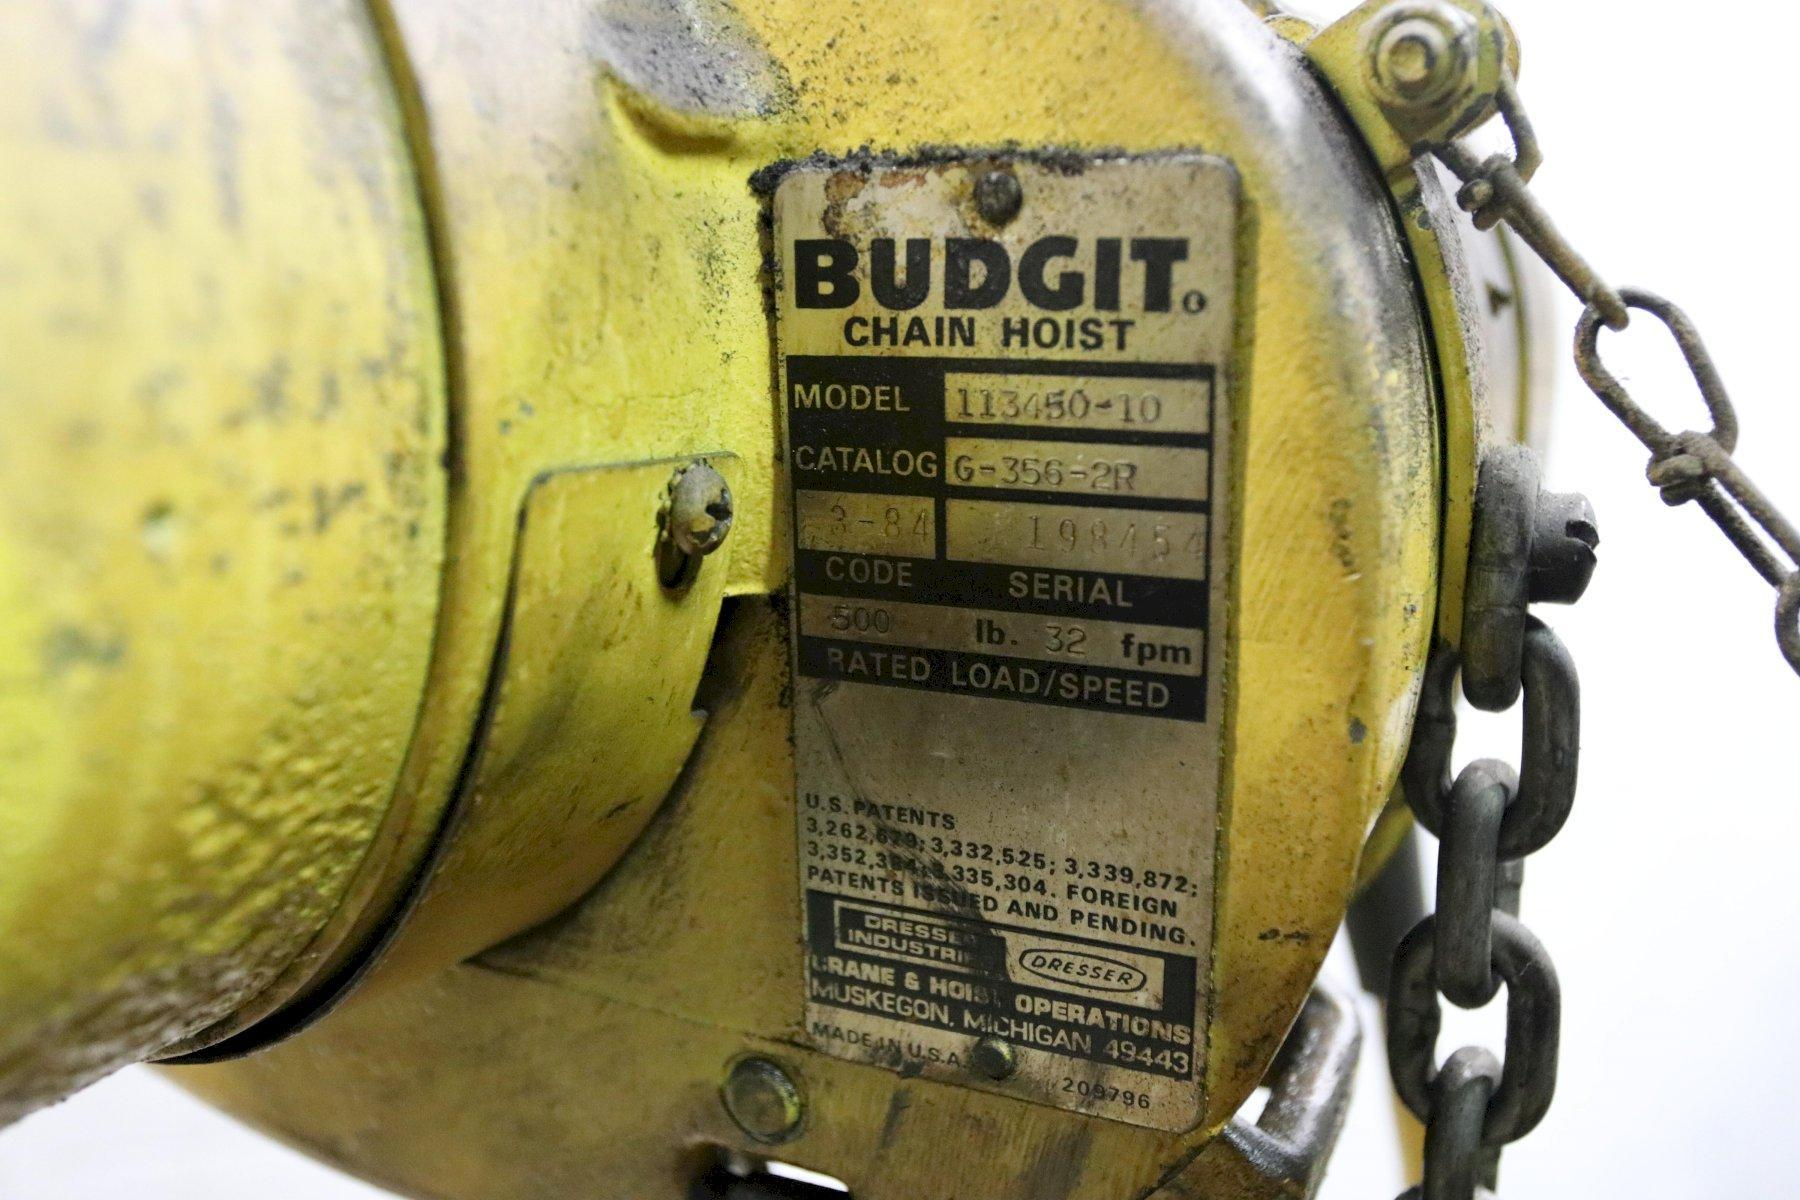 1/4 TON BUDGIT ELECTRIC POWERED CHAIN HOIST: STOCK #11999